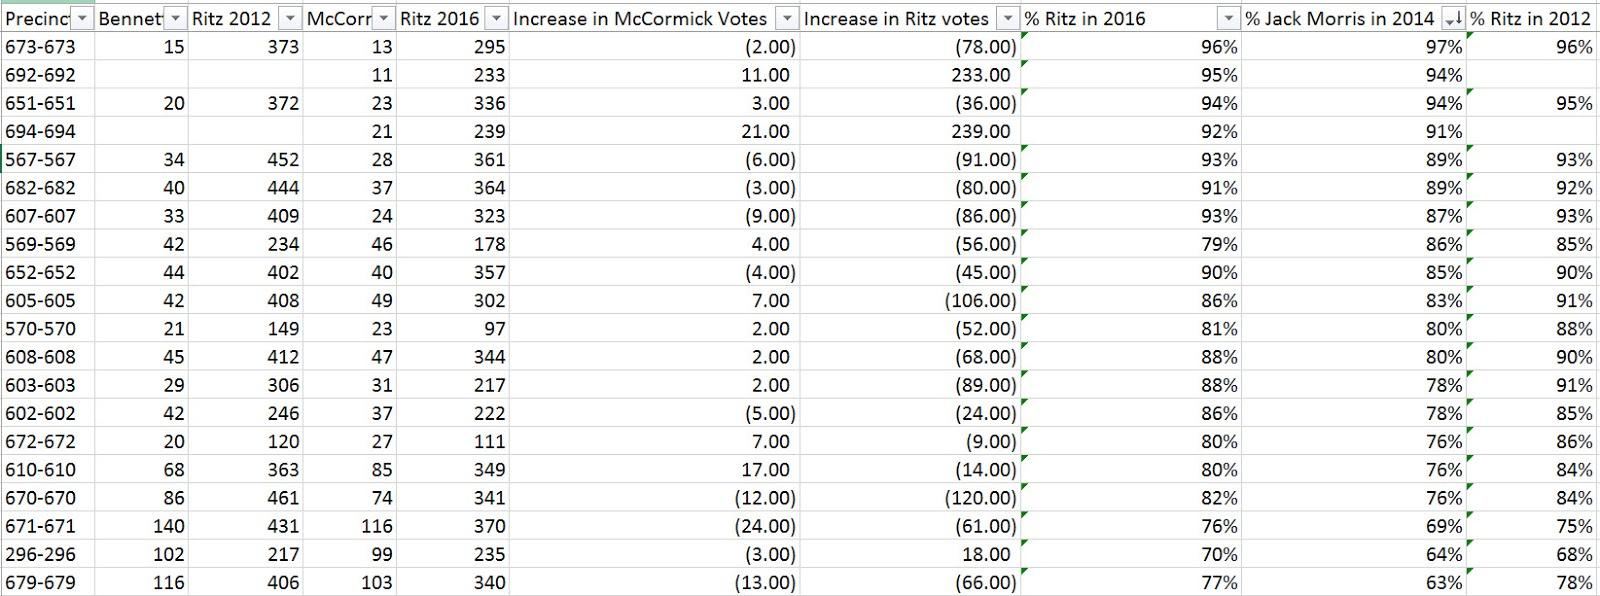 voter suppression doesn t explain southeast fort wayne vote drop